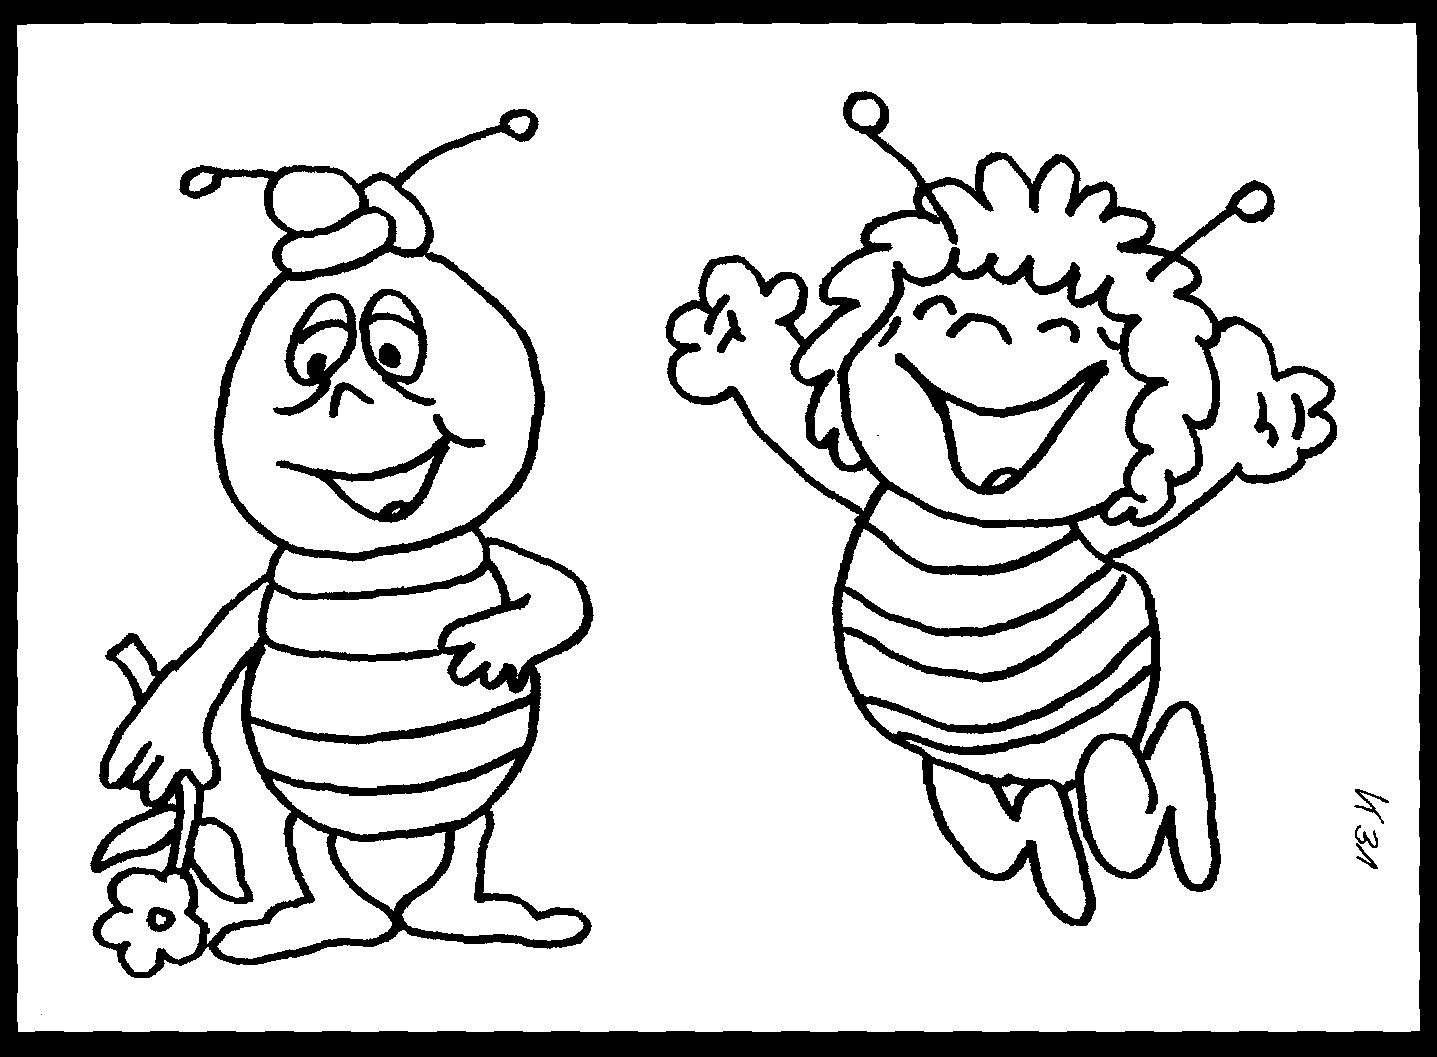 Top 20 Ausmalbilder Biene - Beste Wohnkultur Bastelideen